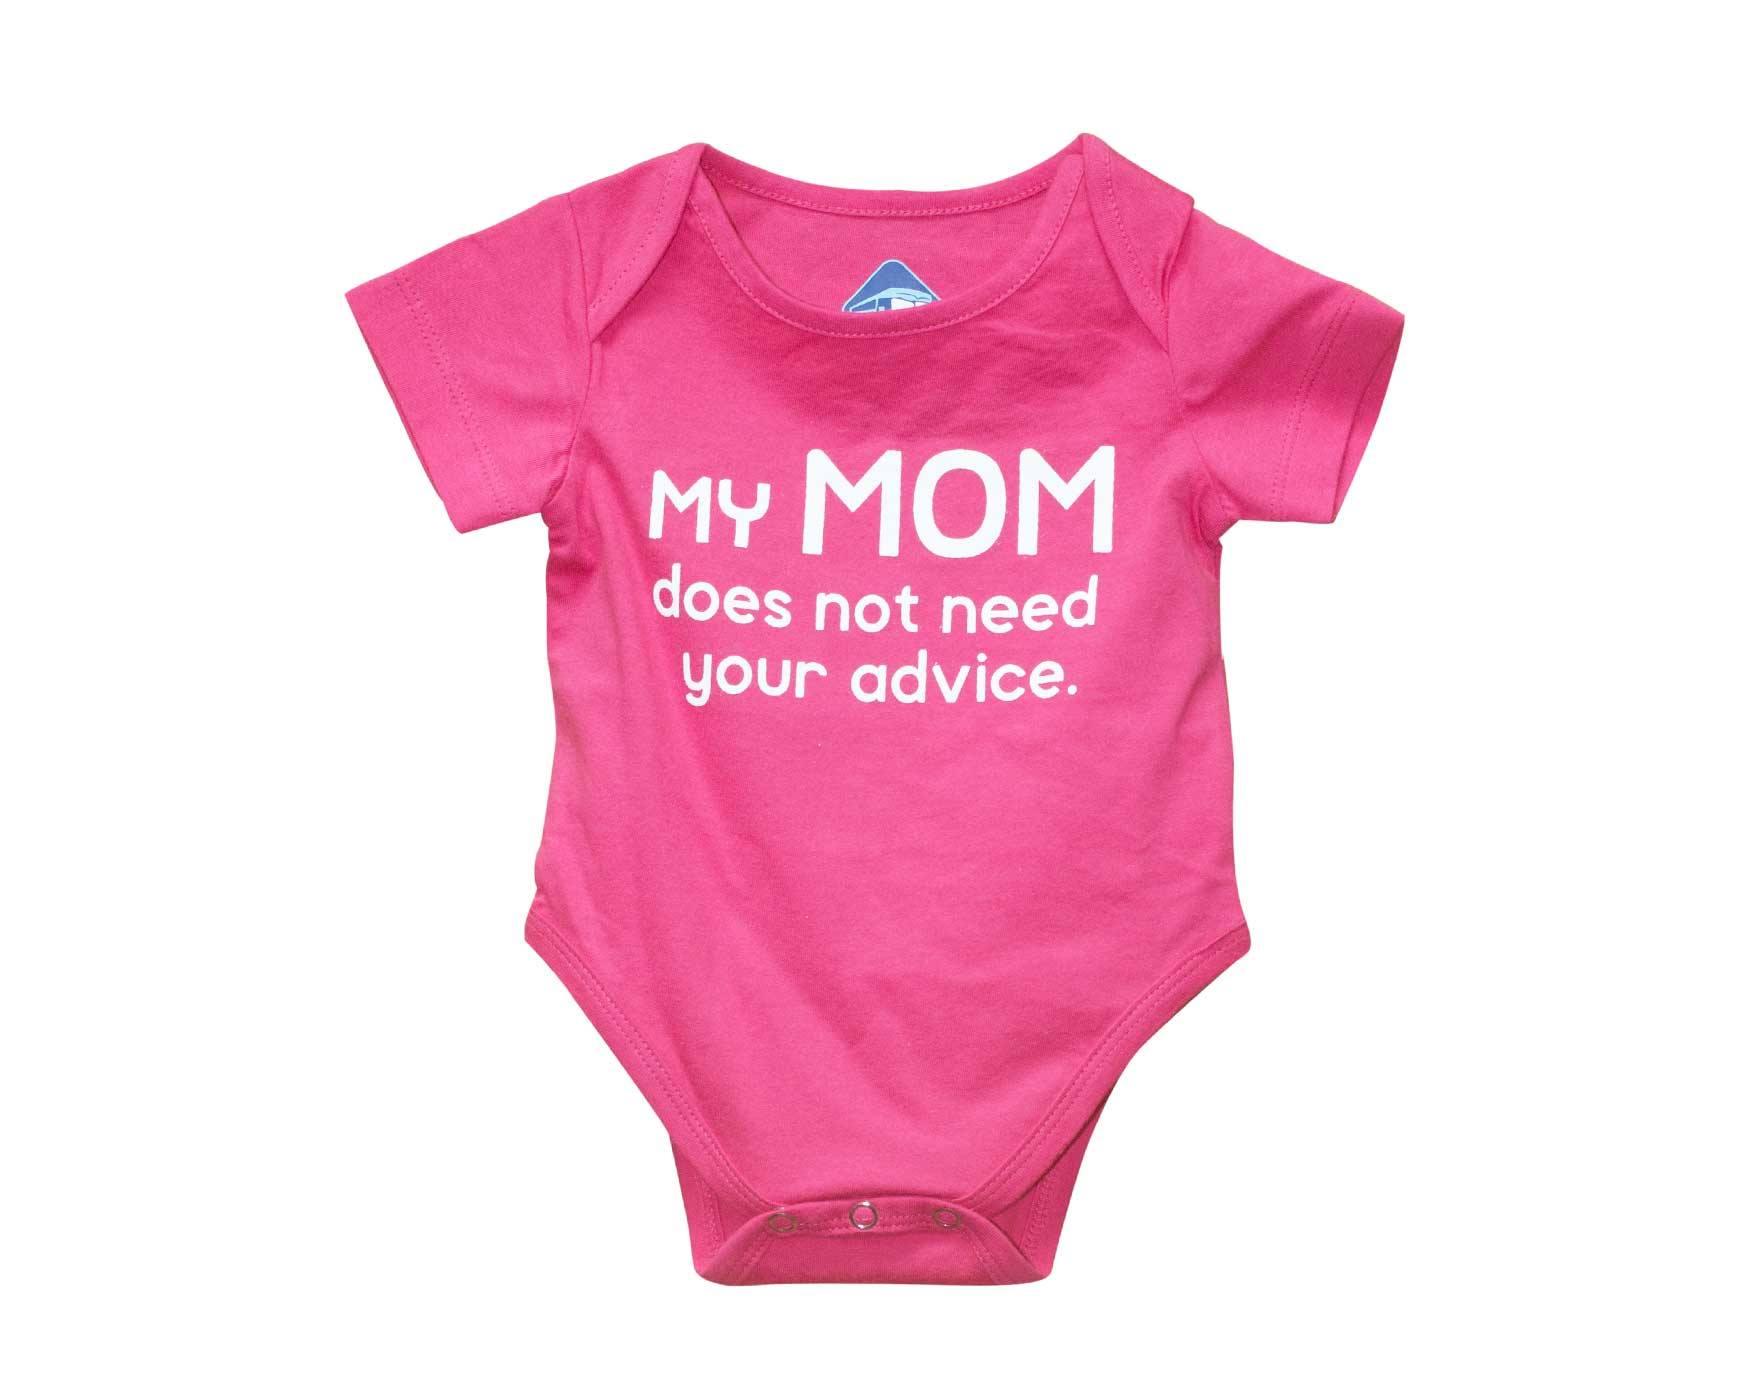 mom Needs no advice rompers.jpg